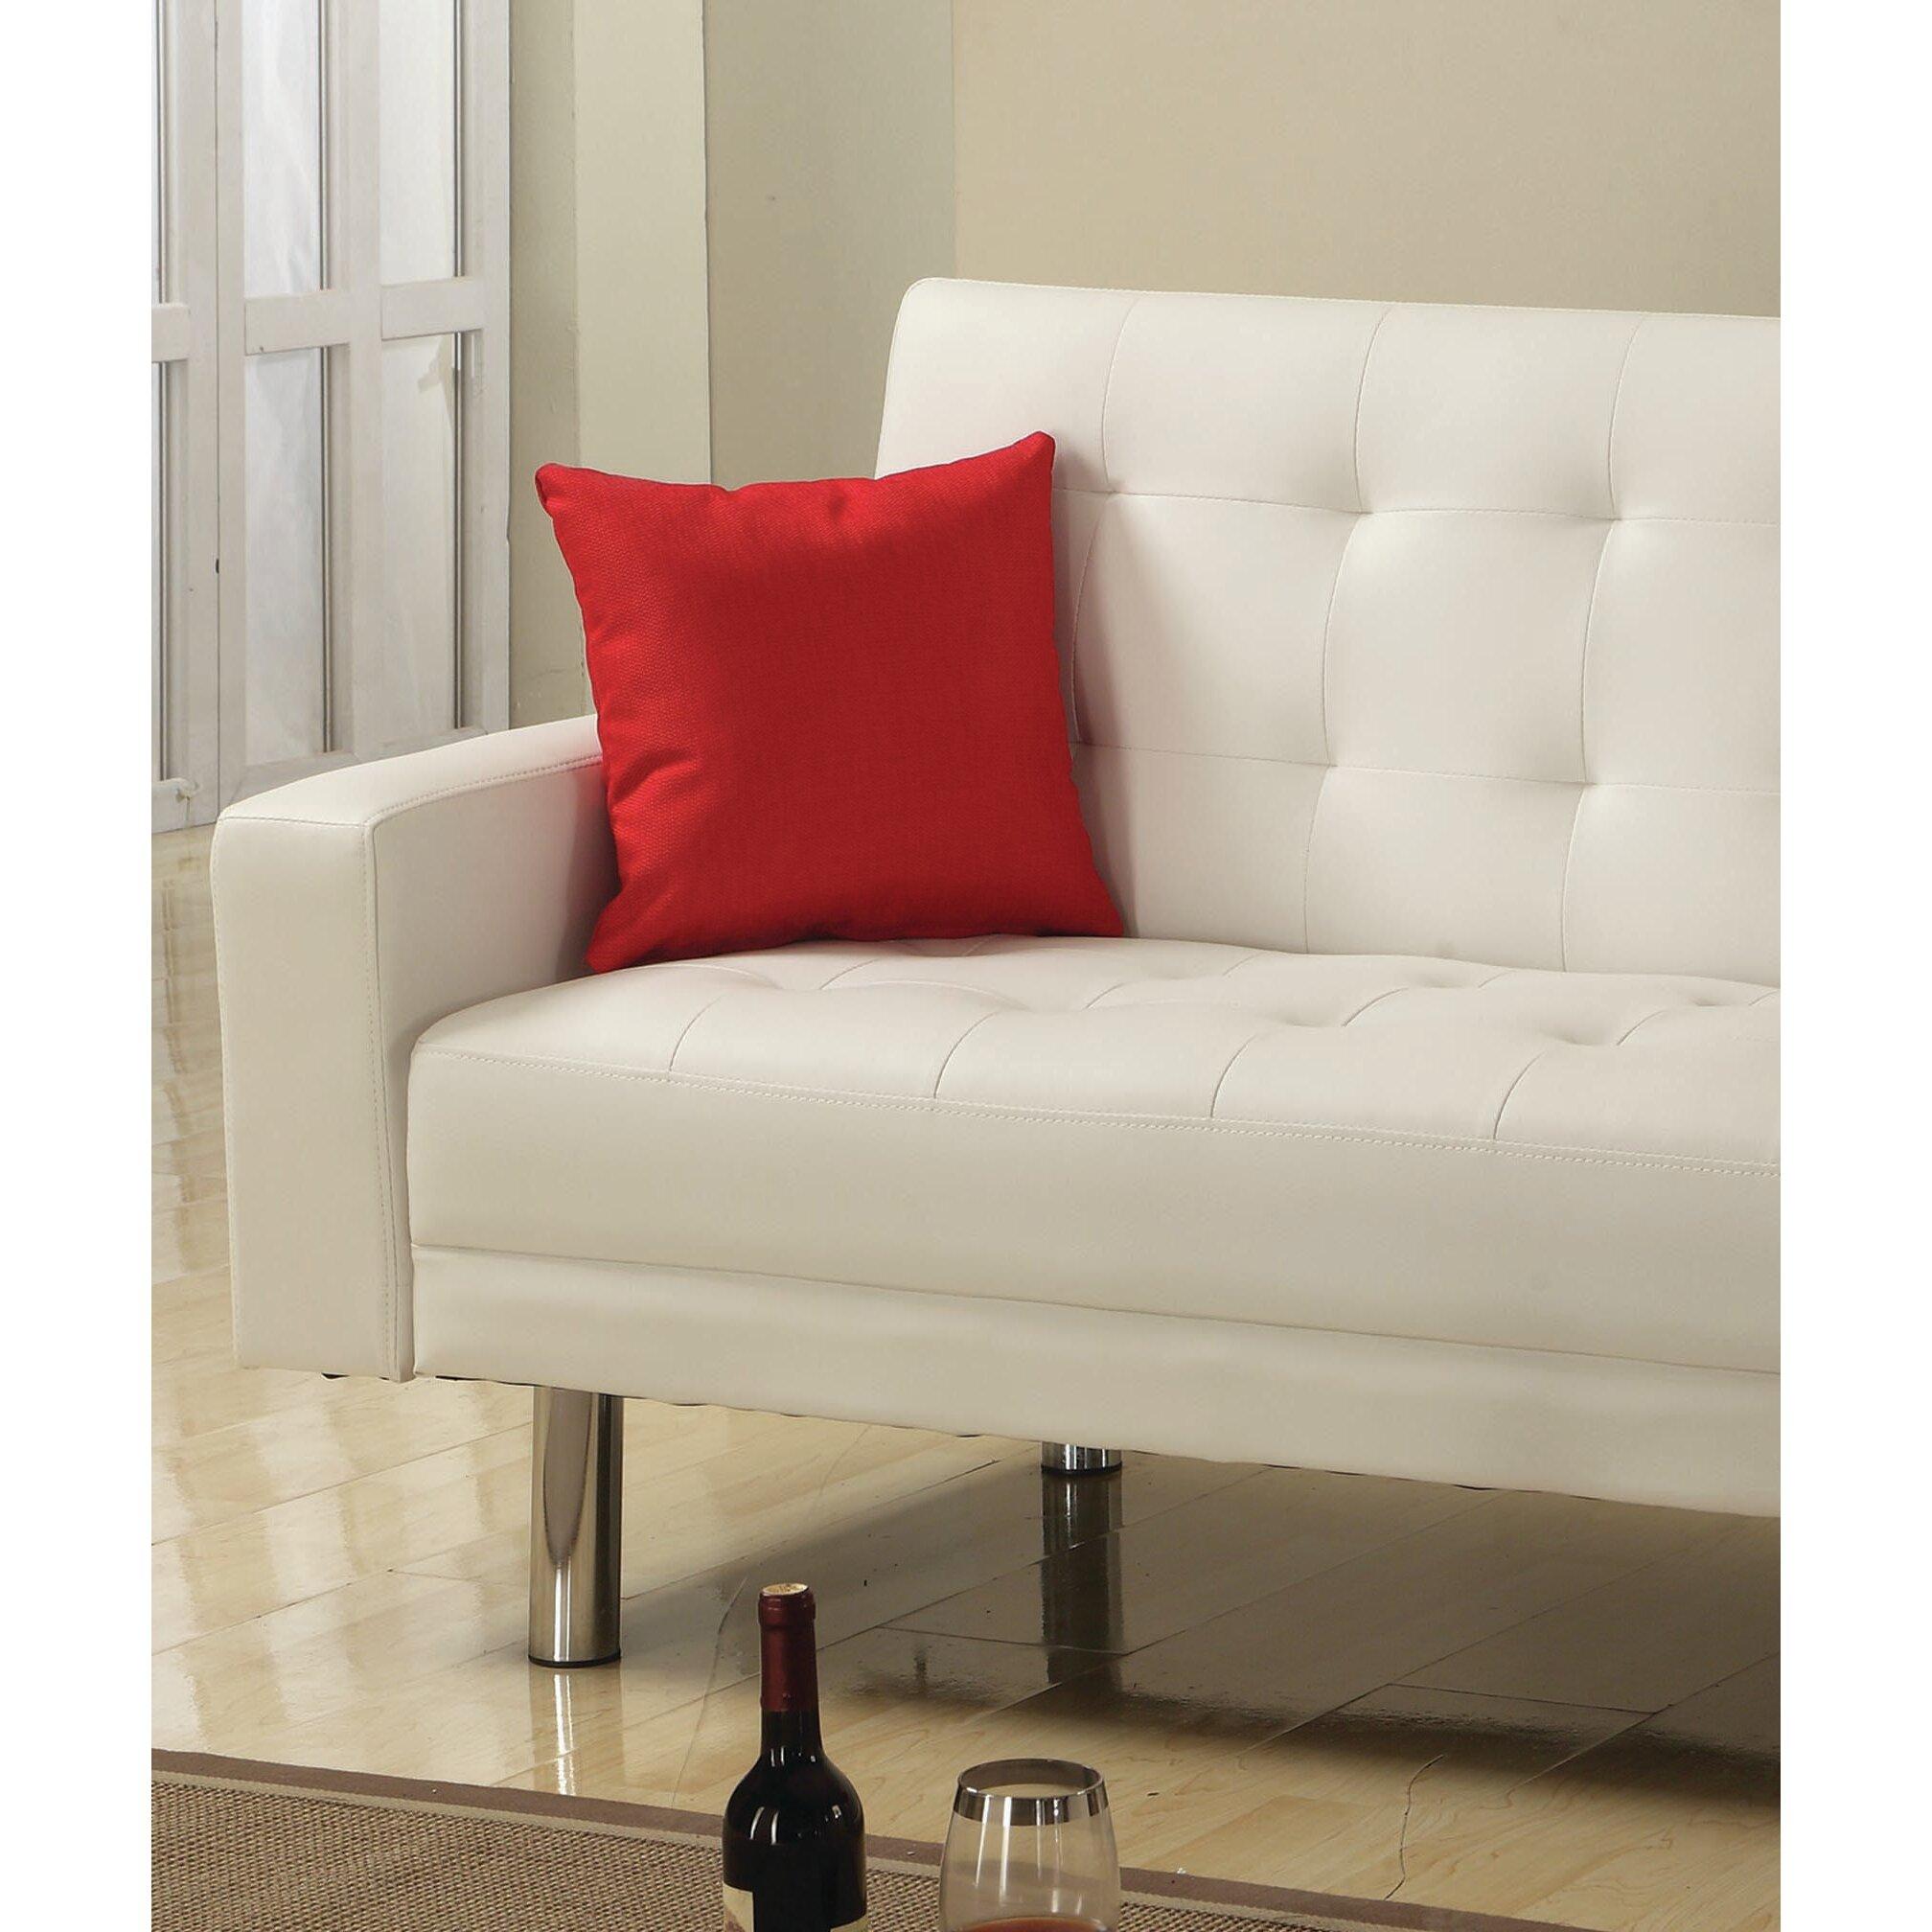 bestmasterfurniture futon and mattress reviews wayfair. Black Bedroom Furniture Sets. Home Design Ideas